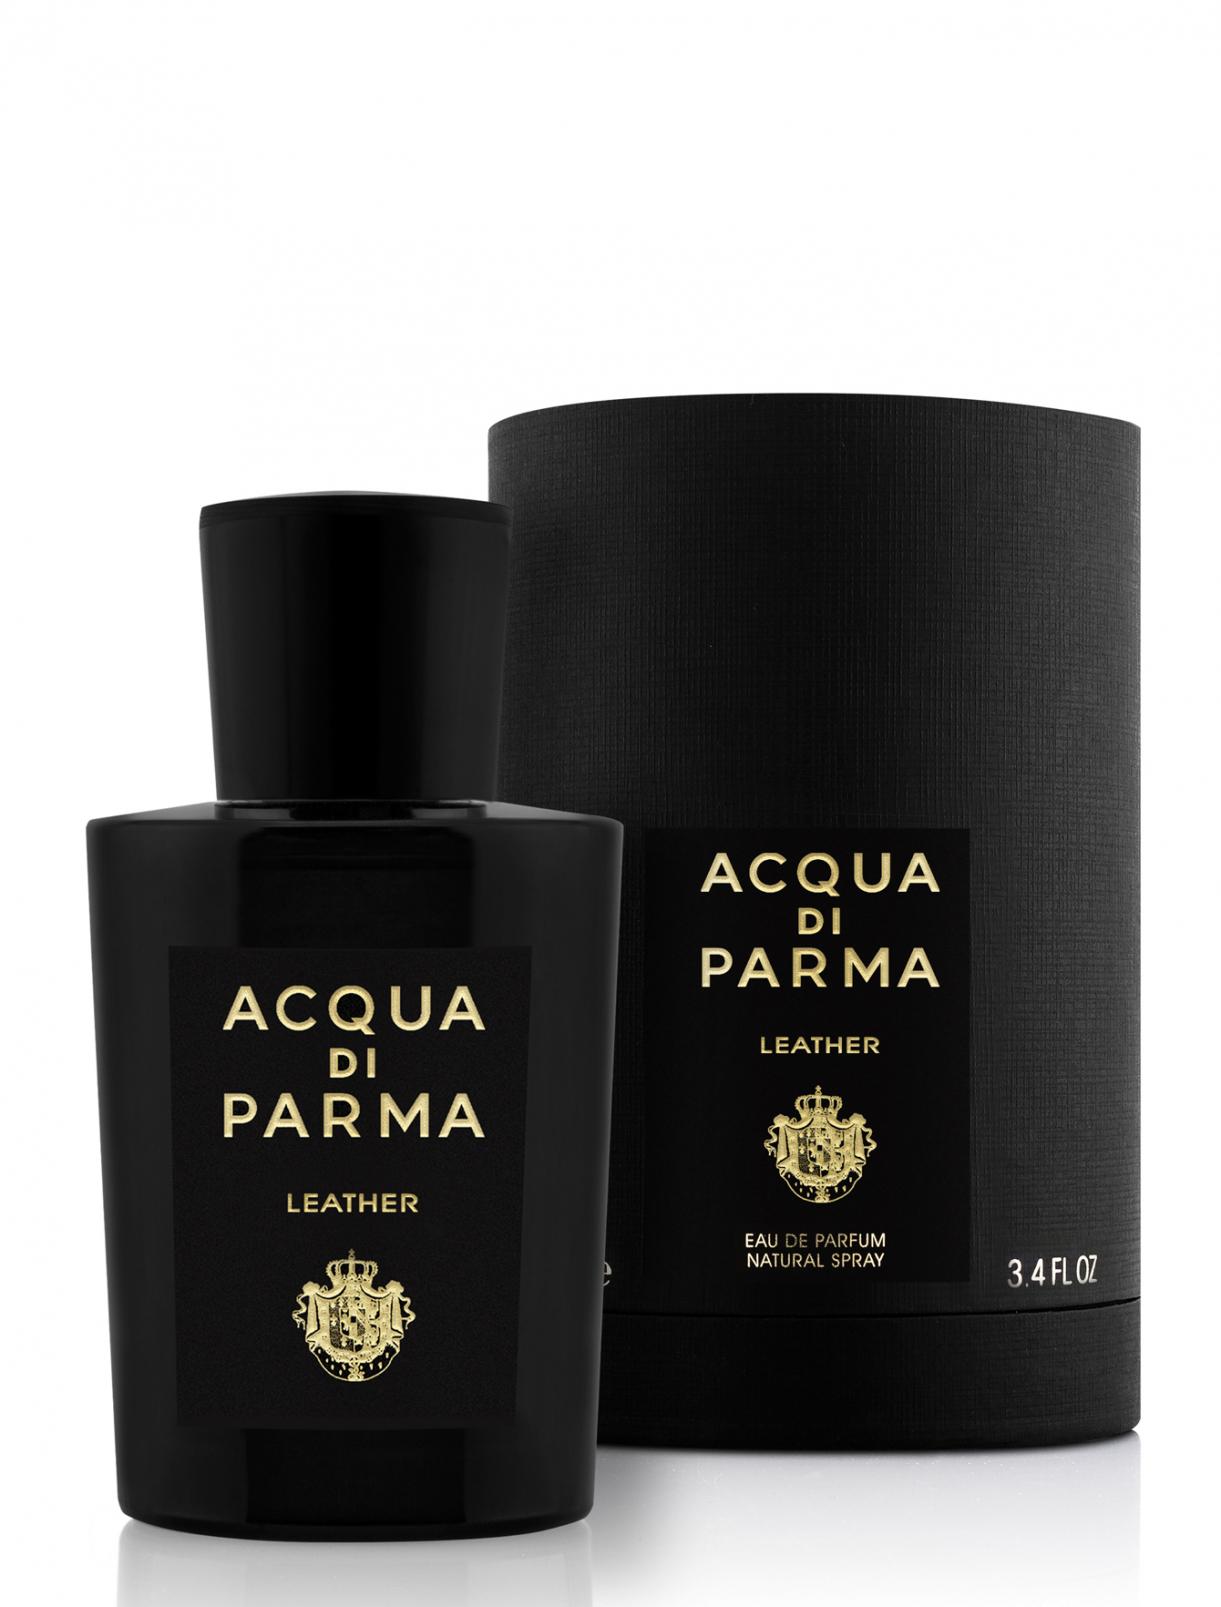 Парфюмерная вода 100 мл Leather Acqua di Parma  –  Общий вид